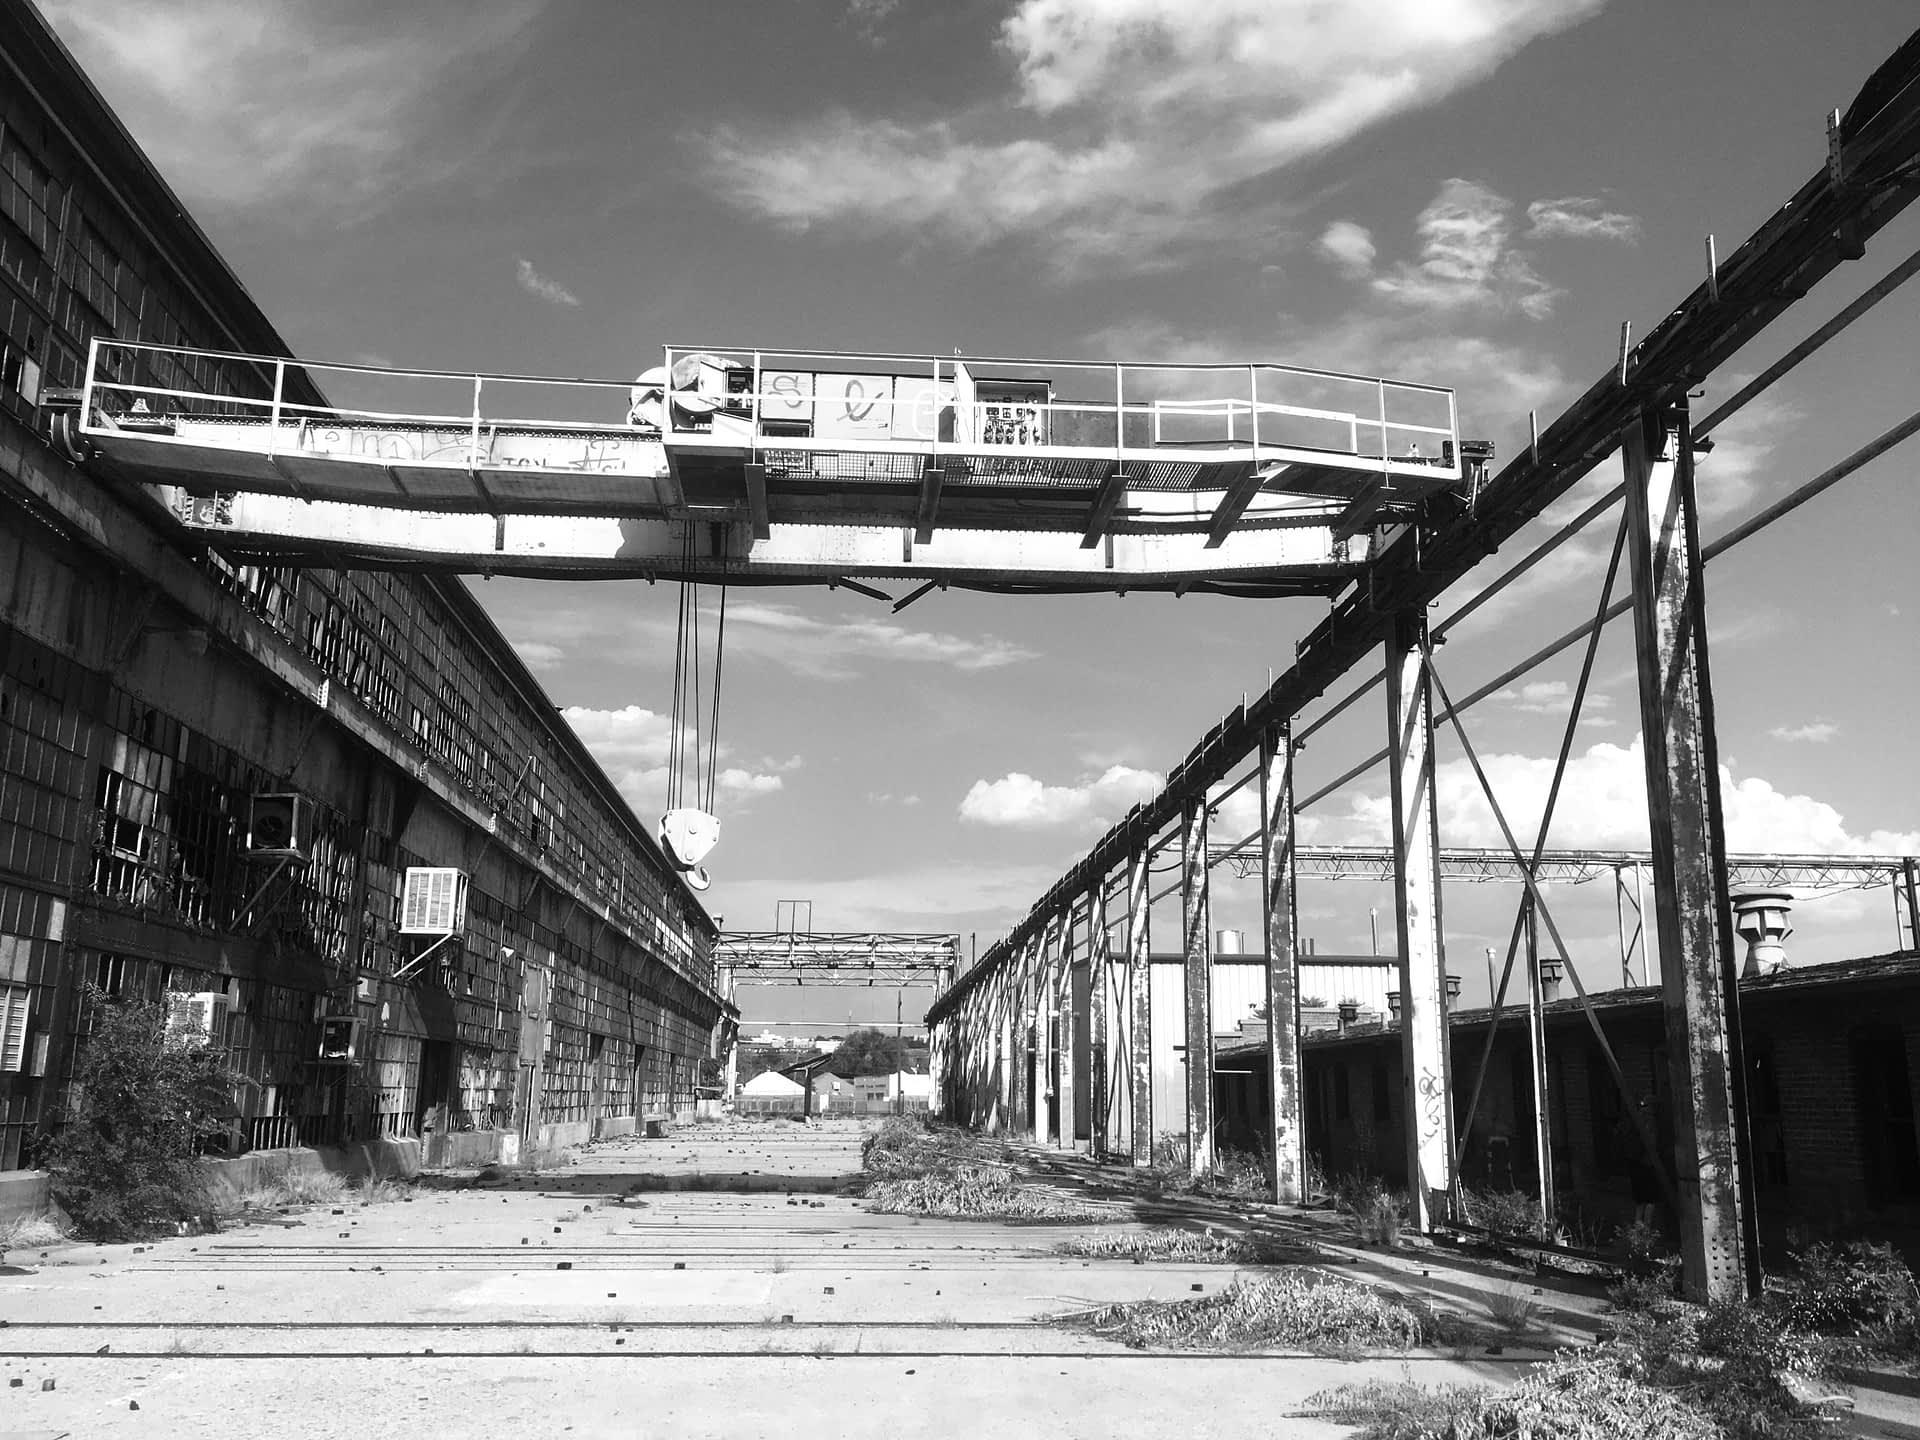 Rail Yards B/W Outside Crane